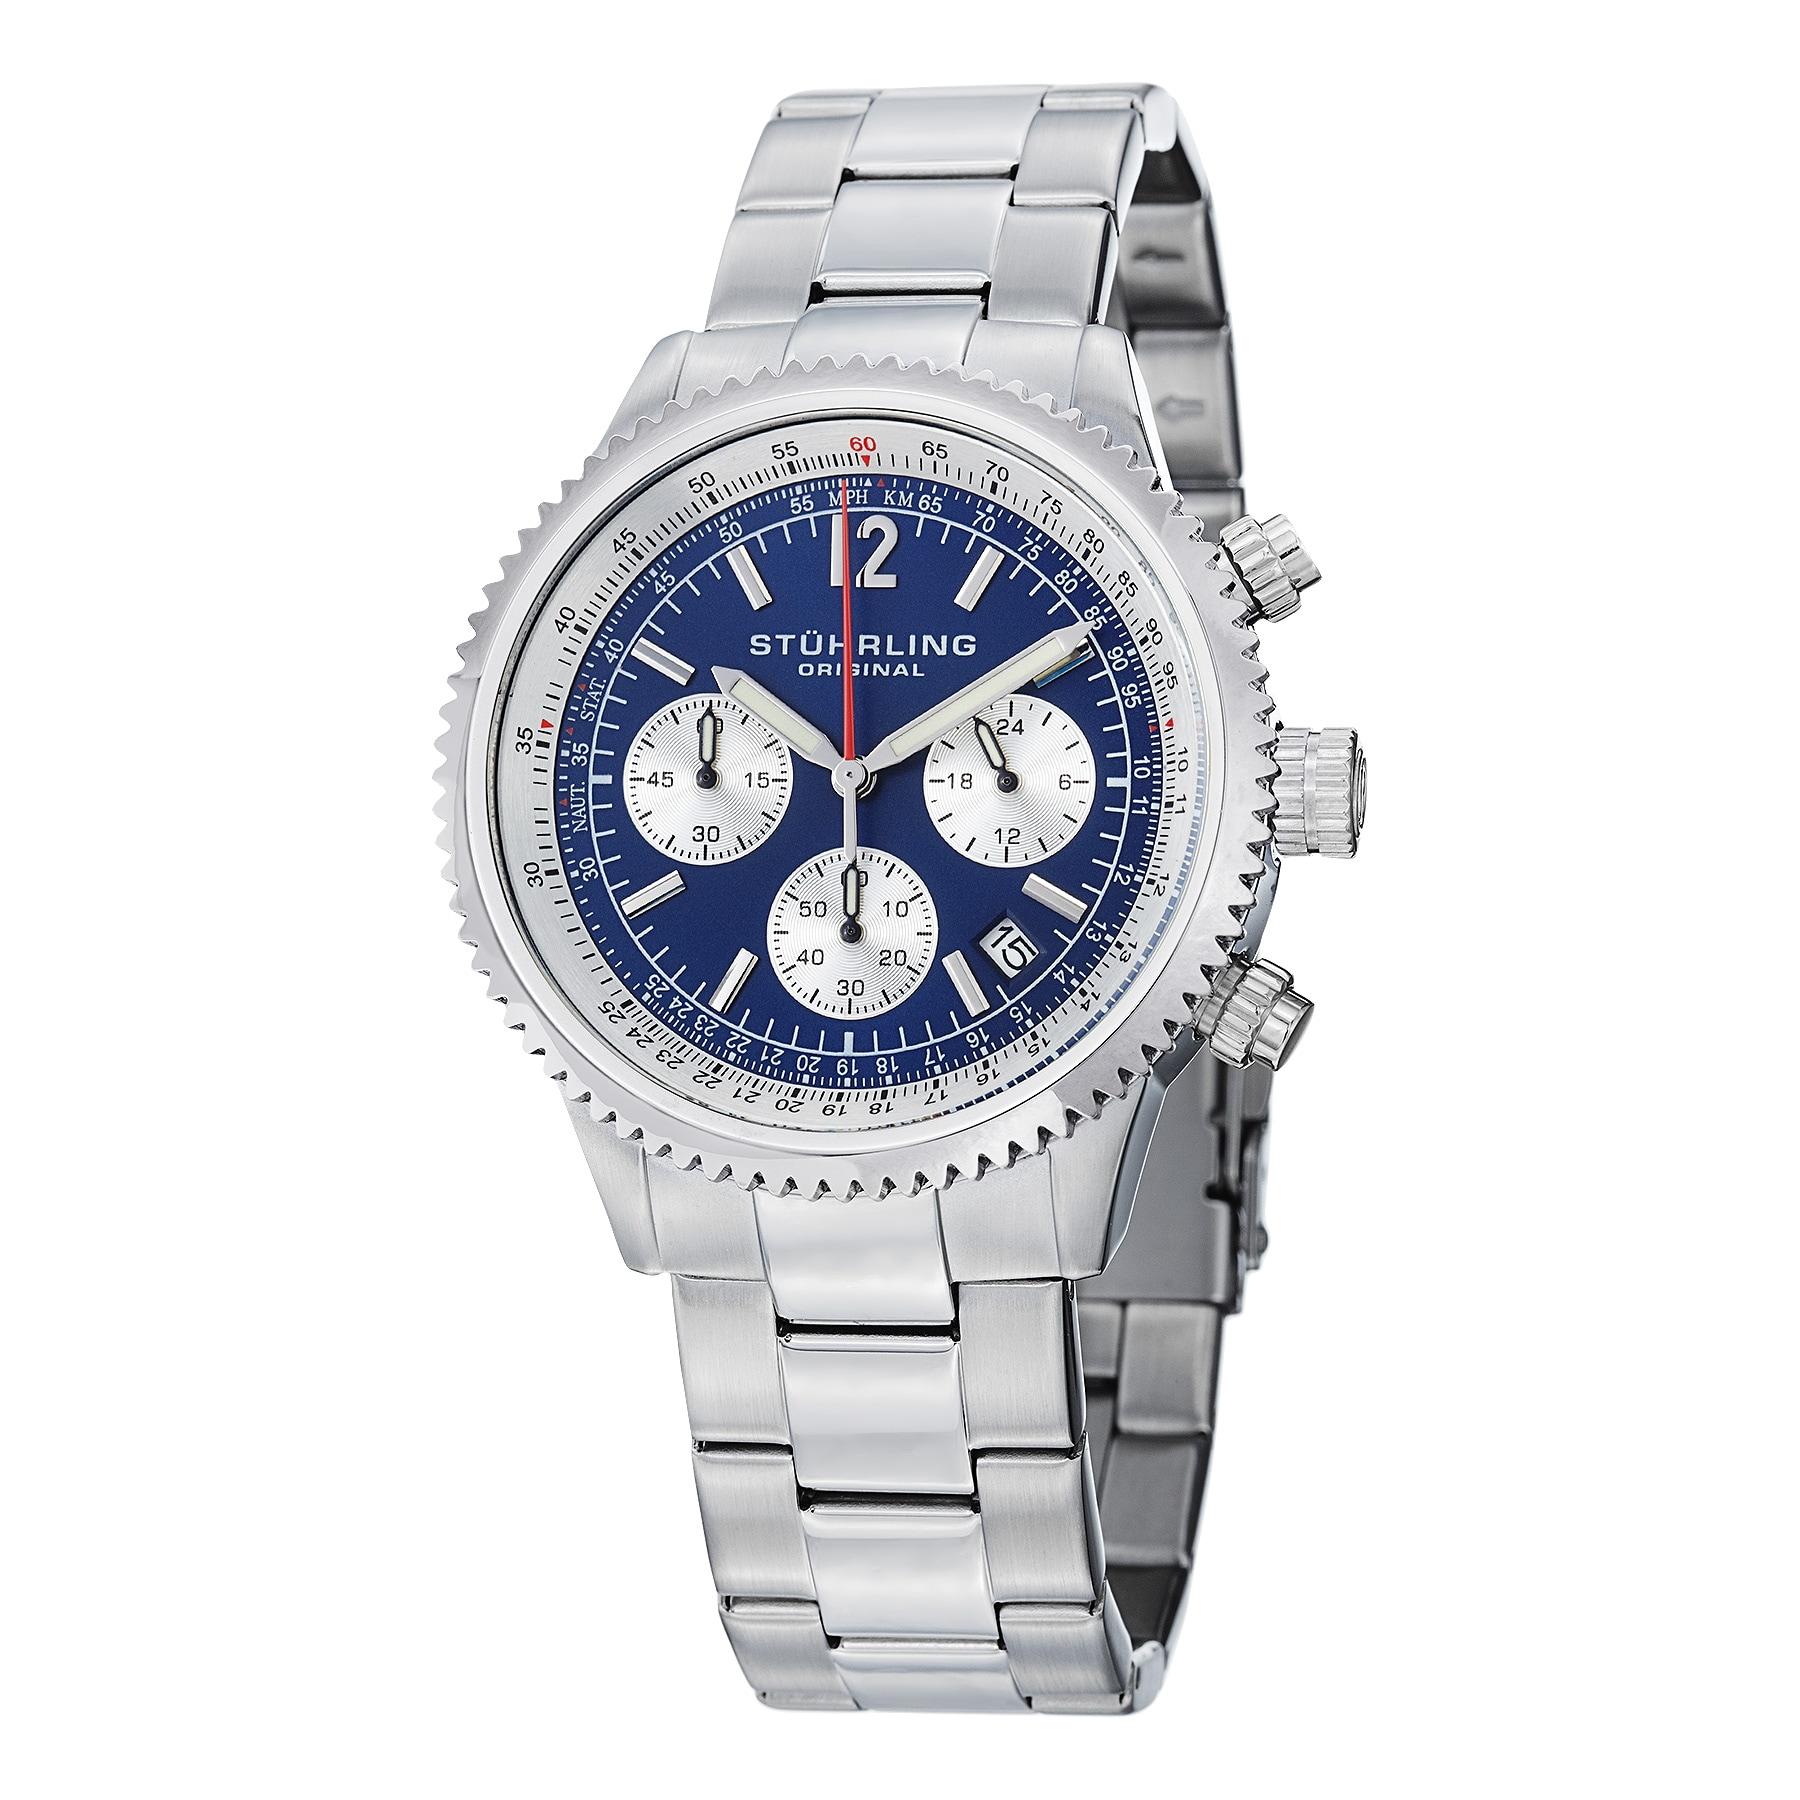 Stuhrling Original Men's Chronograph Monaco Stainless steel Bracelet Watch